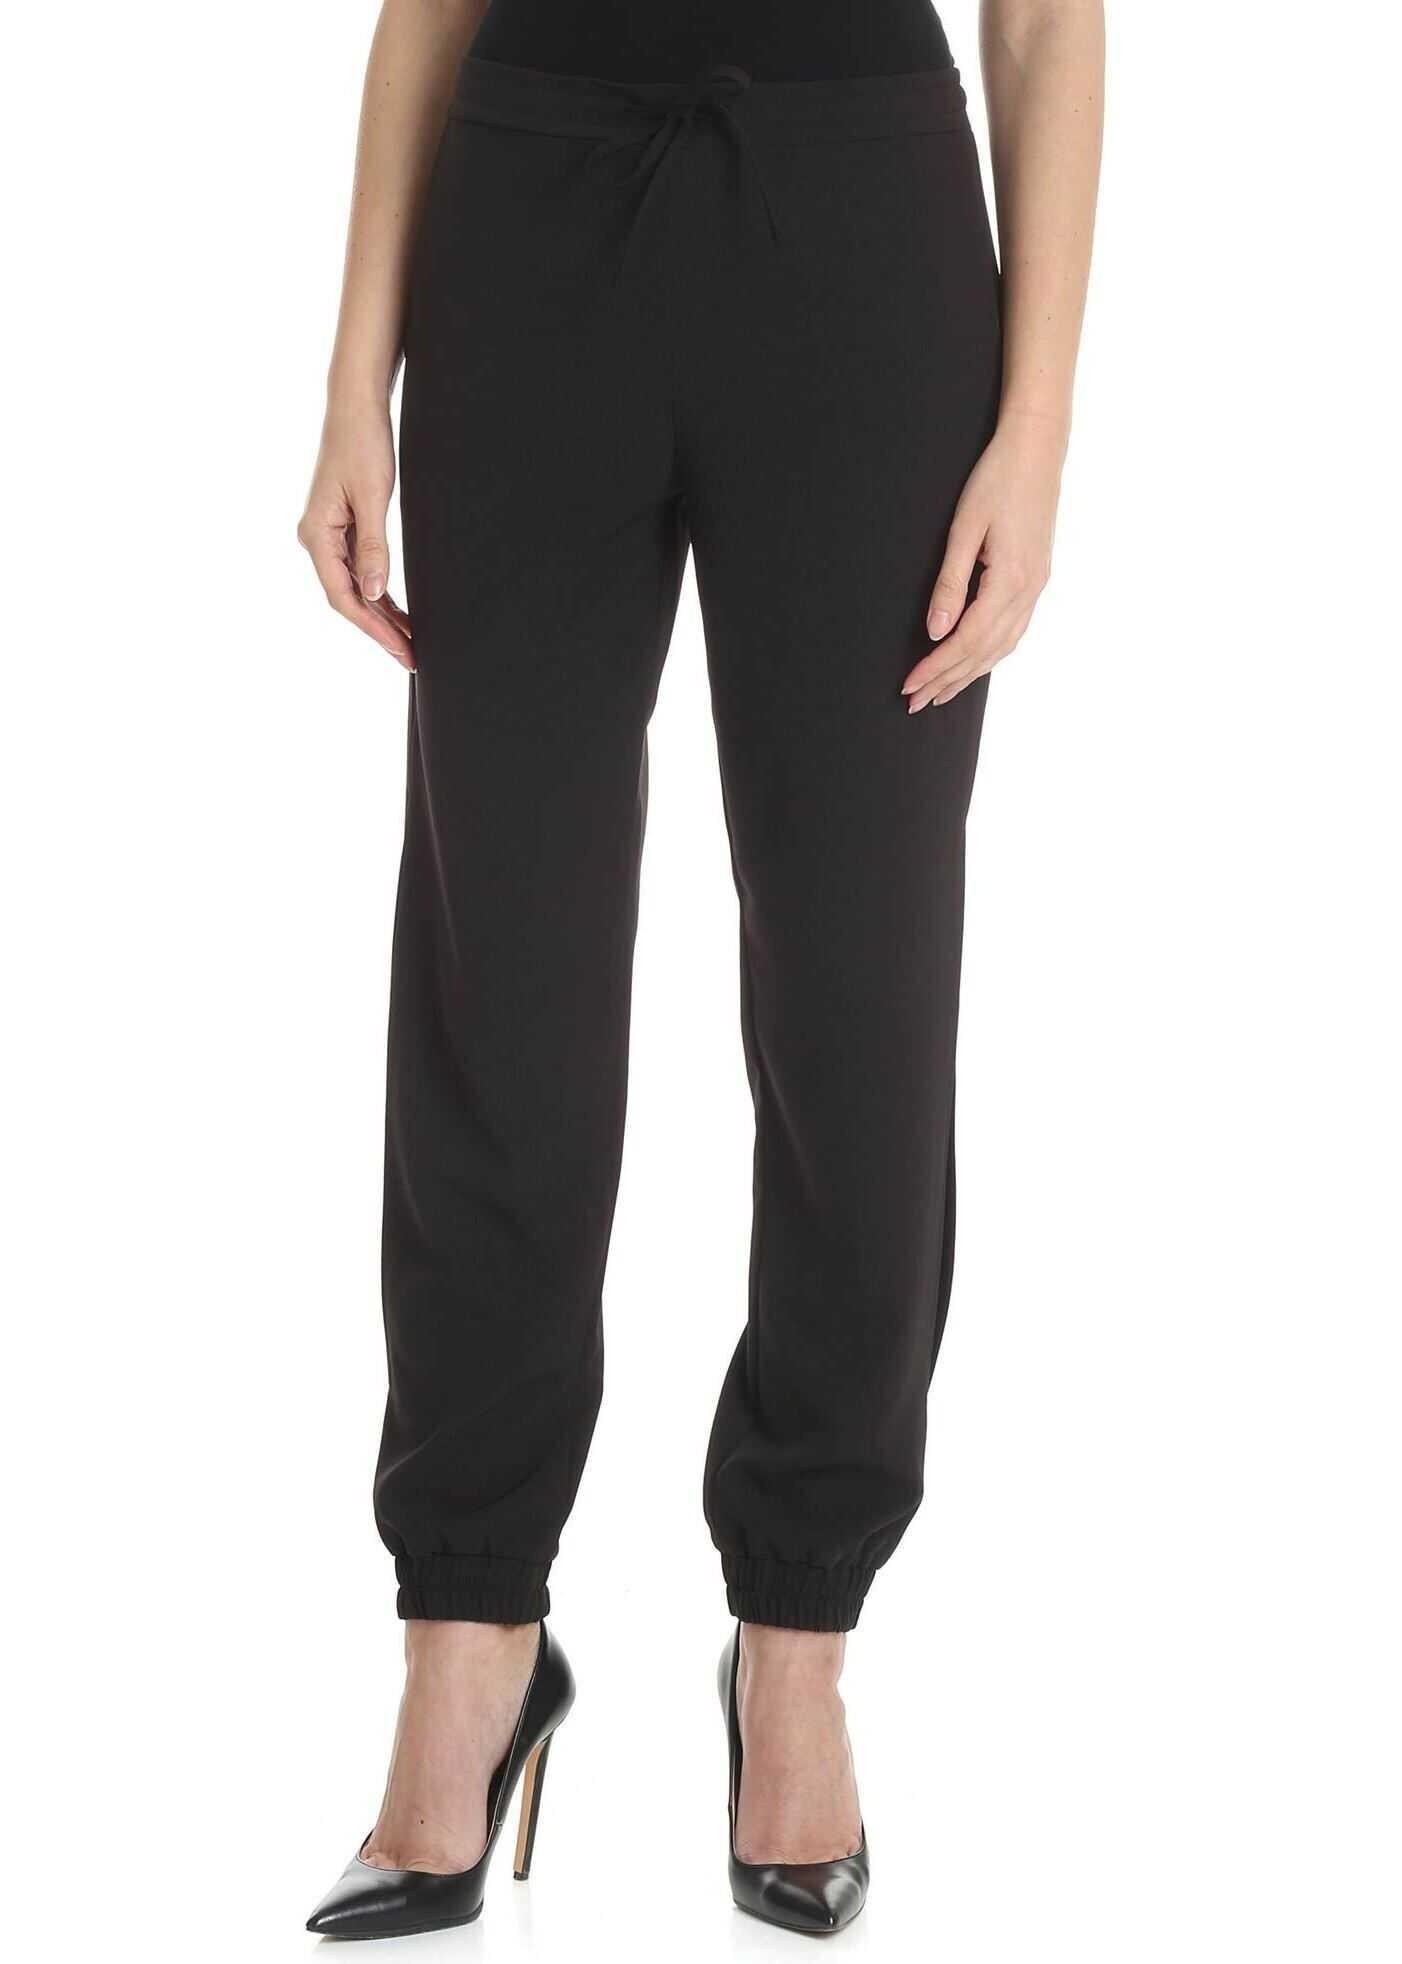 Blugirl Black Jogging Trousers With Blugirl Logo Black